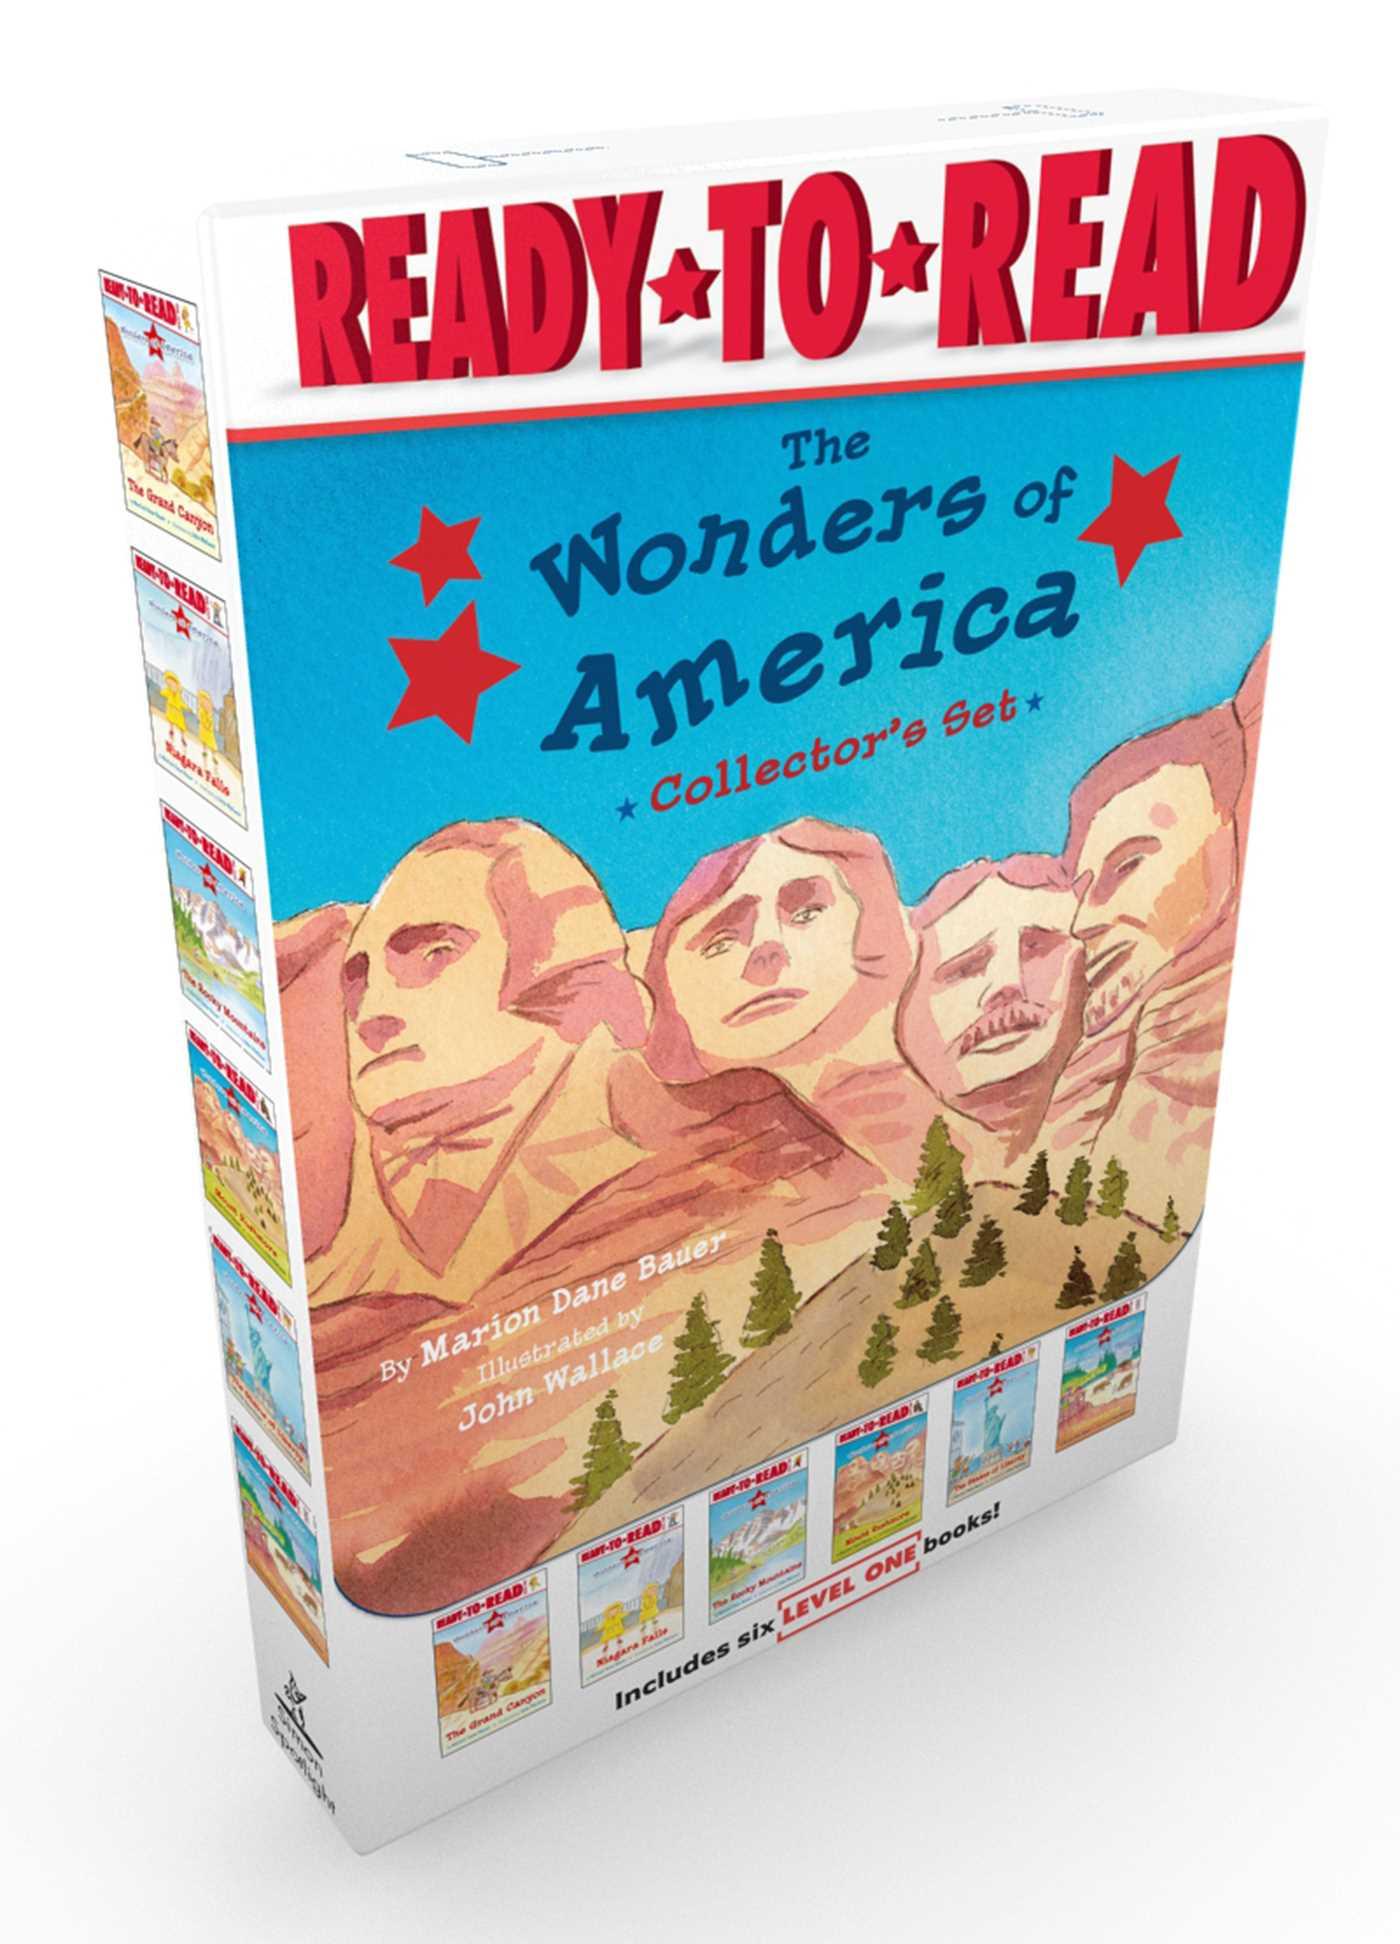 The wonders of america collectors set 9781481478878 hr